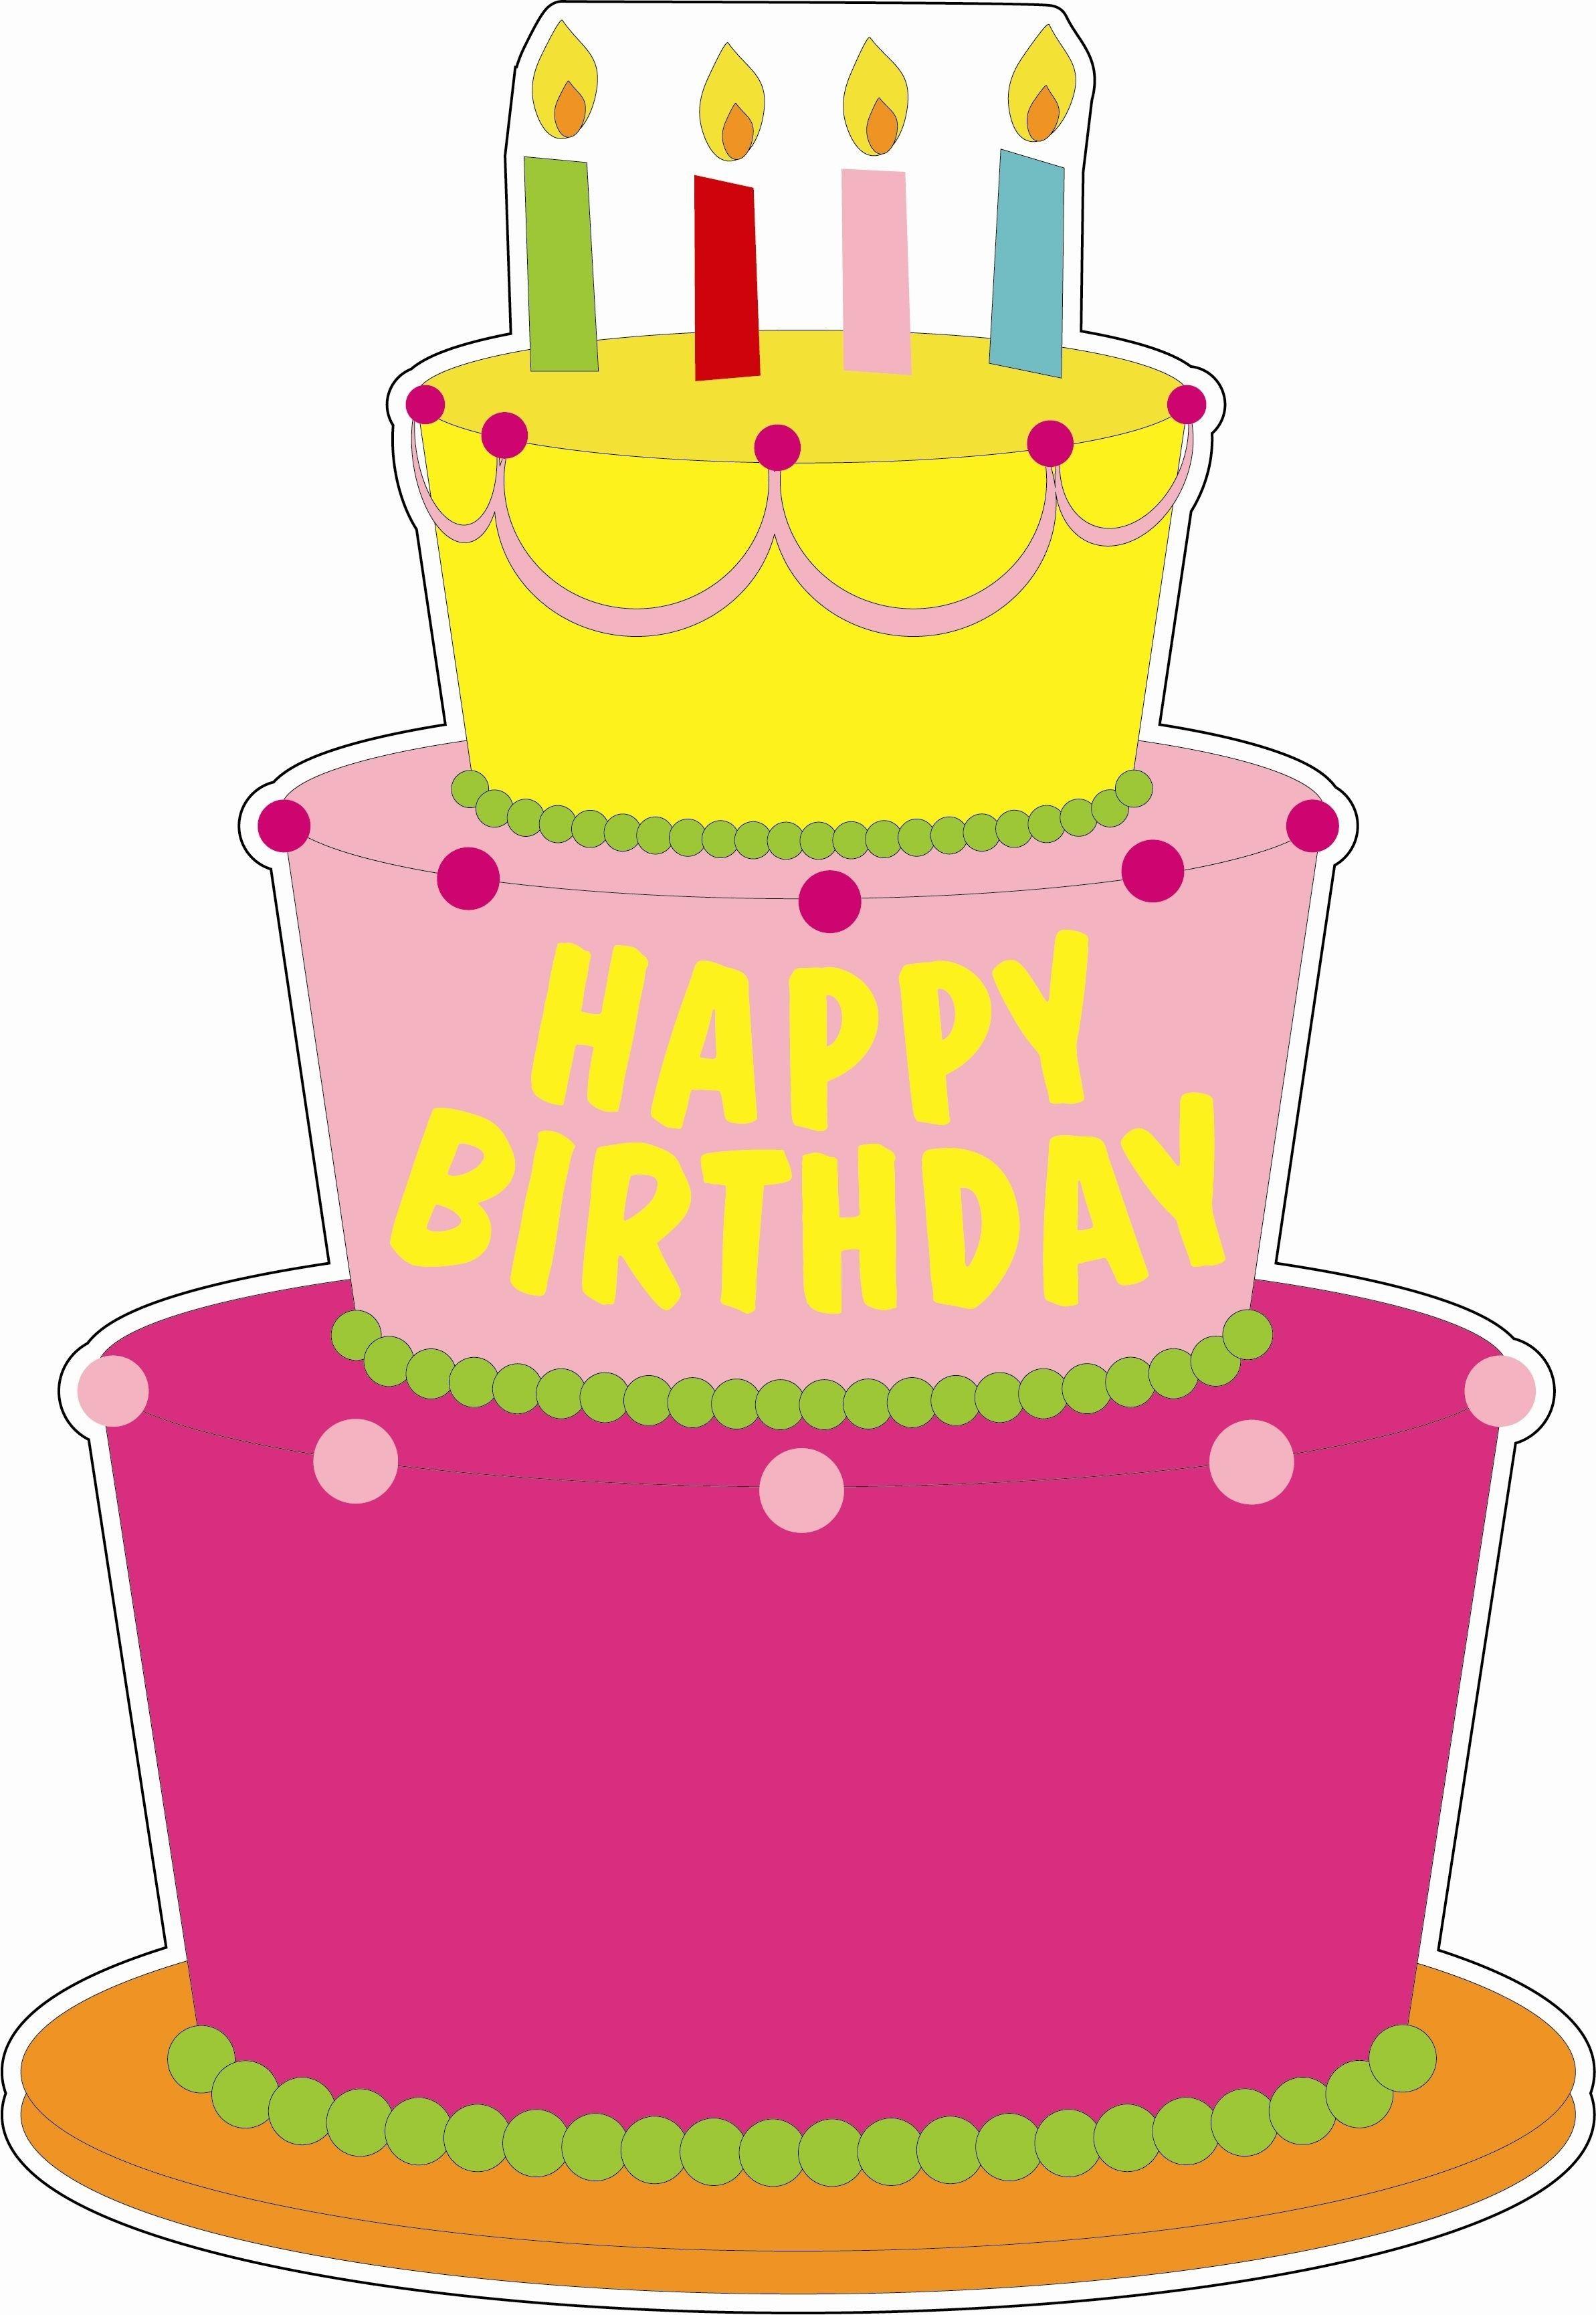 20+ Creative Picture of Birthday Cake Cartoon